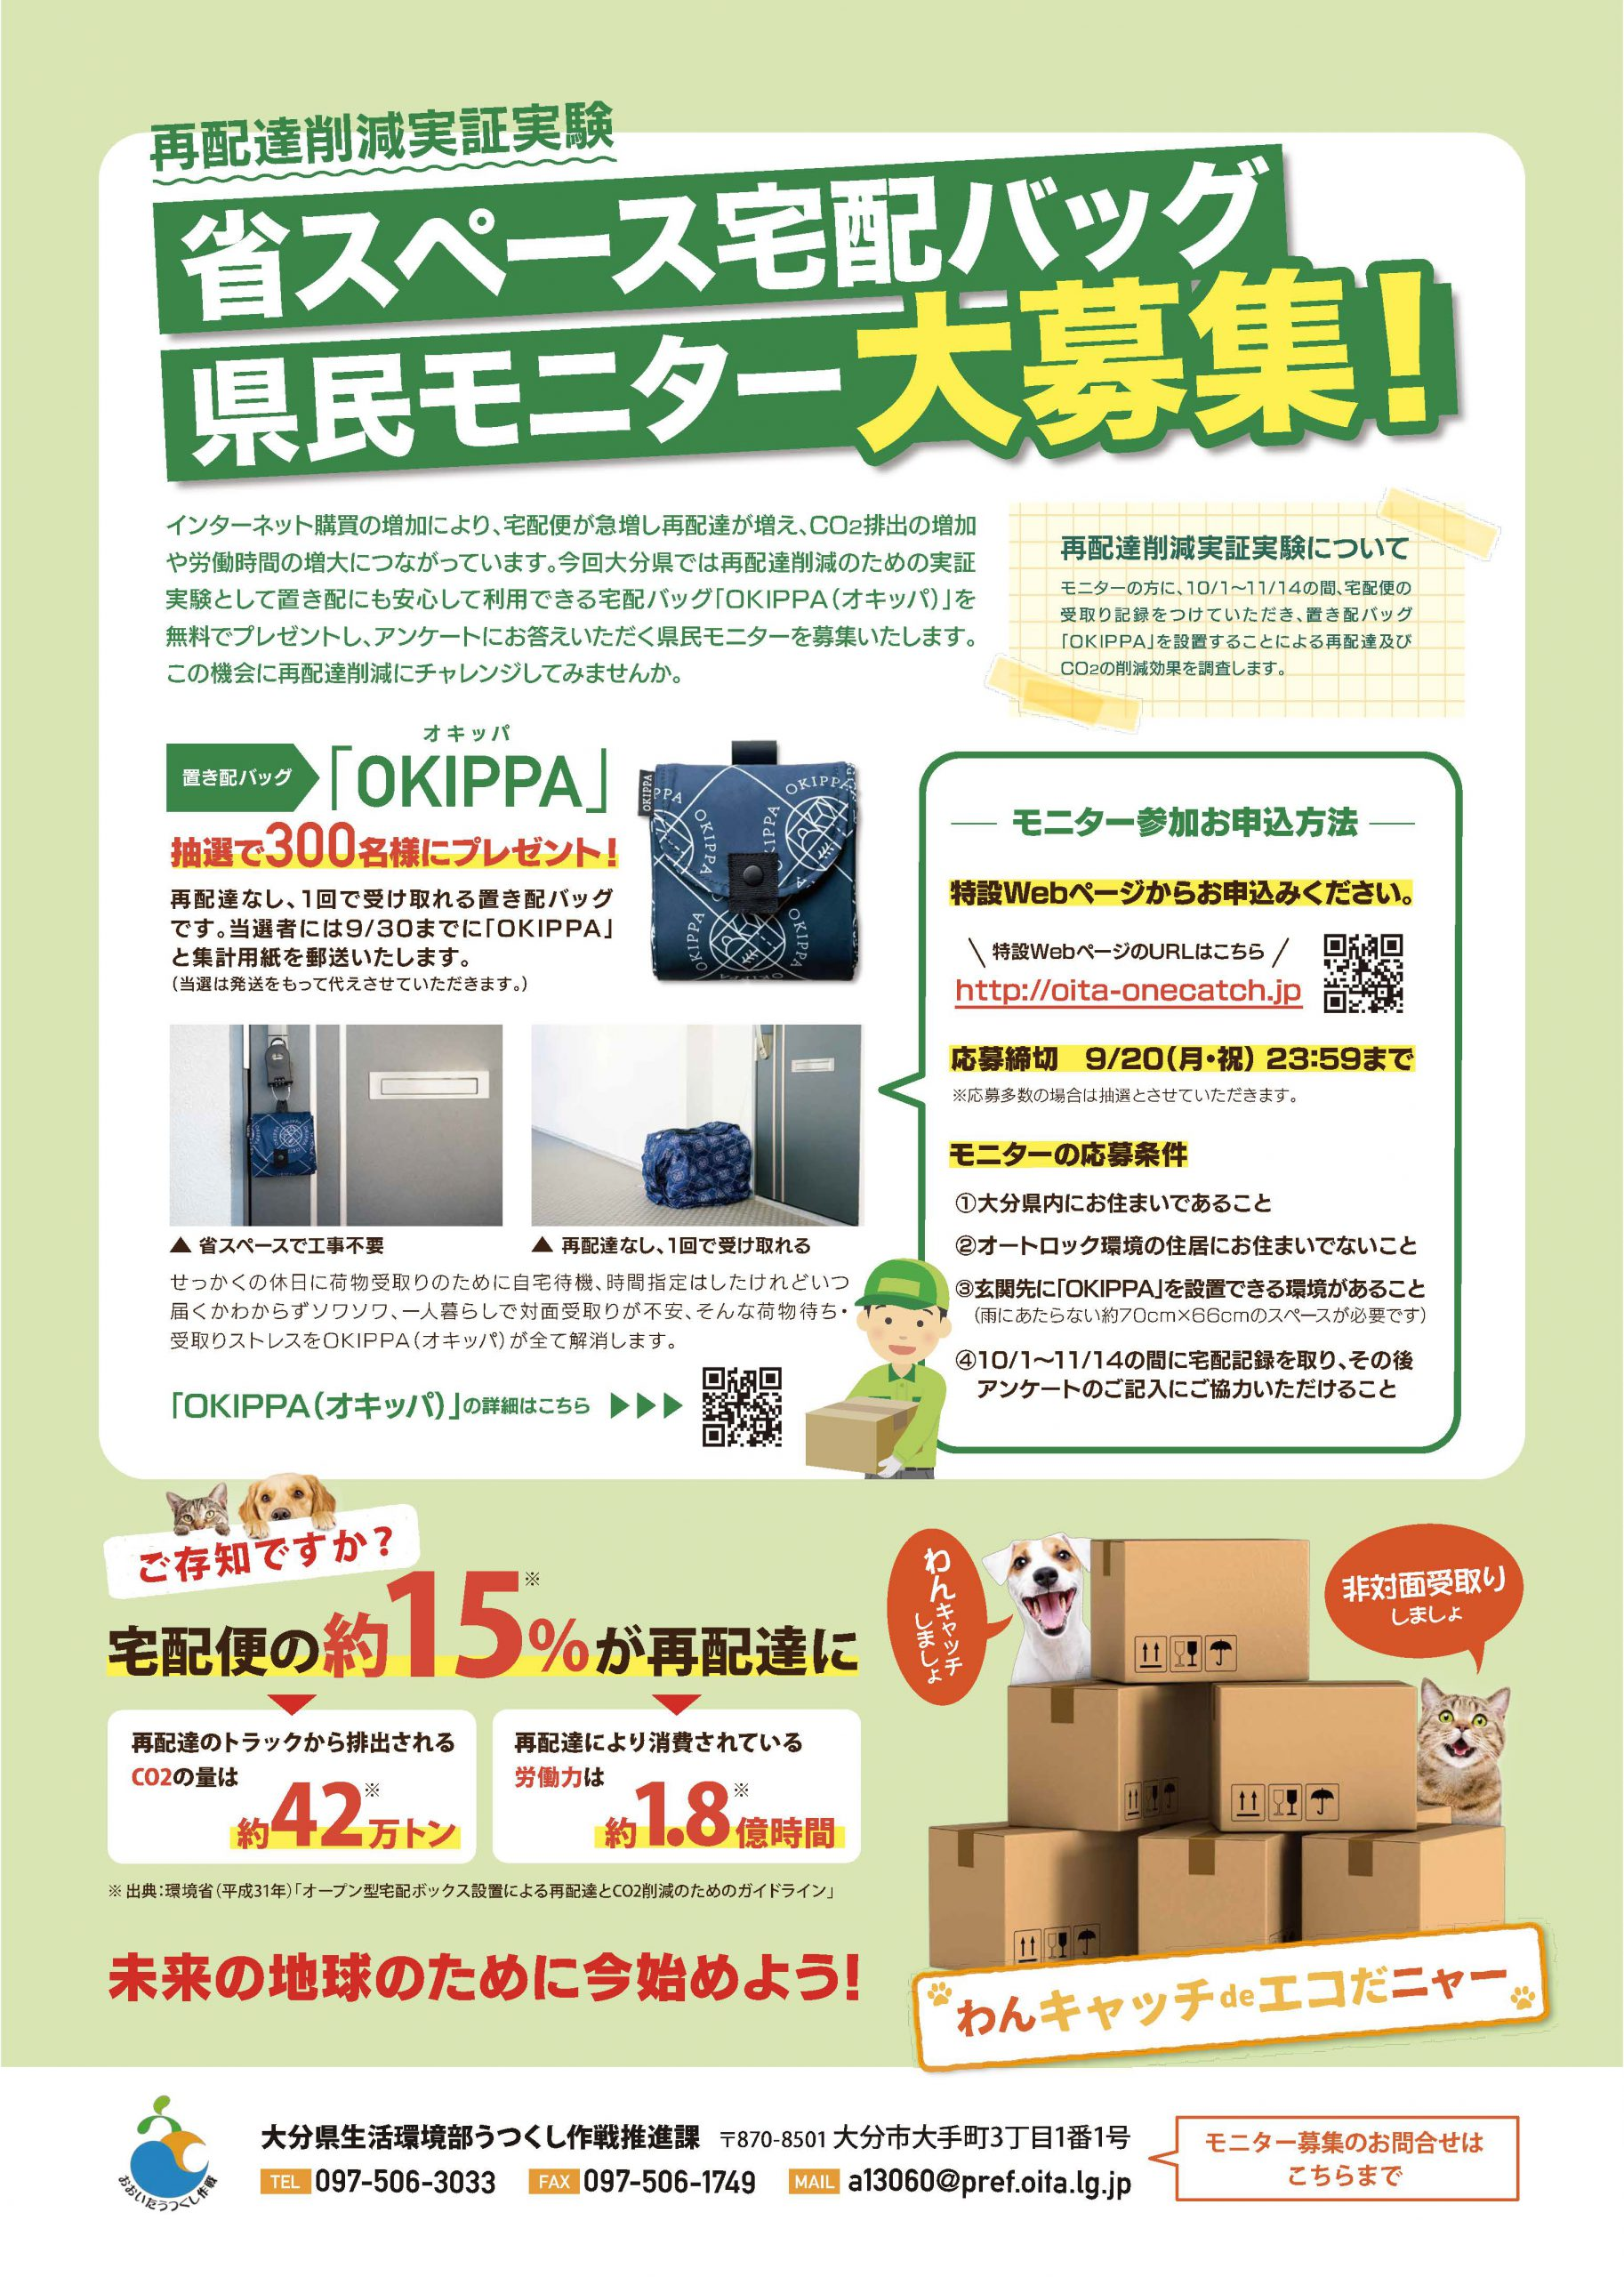 20210820_OKIPPA_大分県宅配バッグモニター募集チラシ©大分県